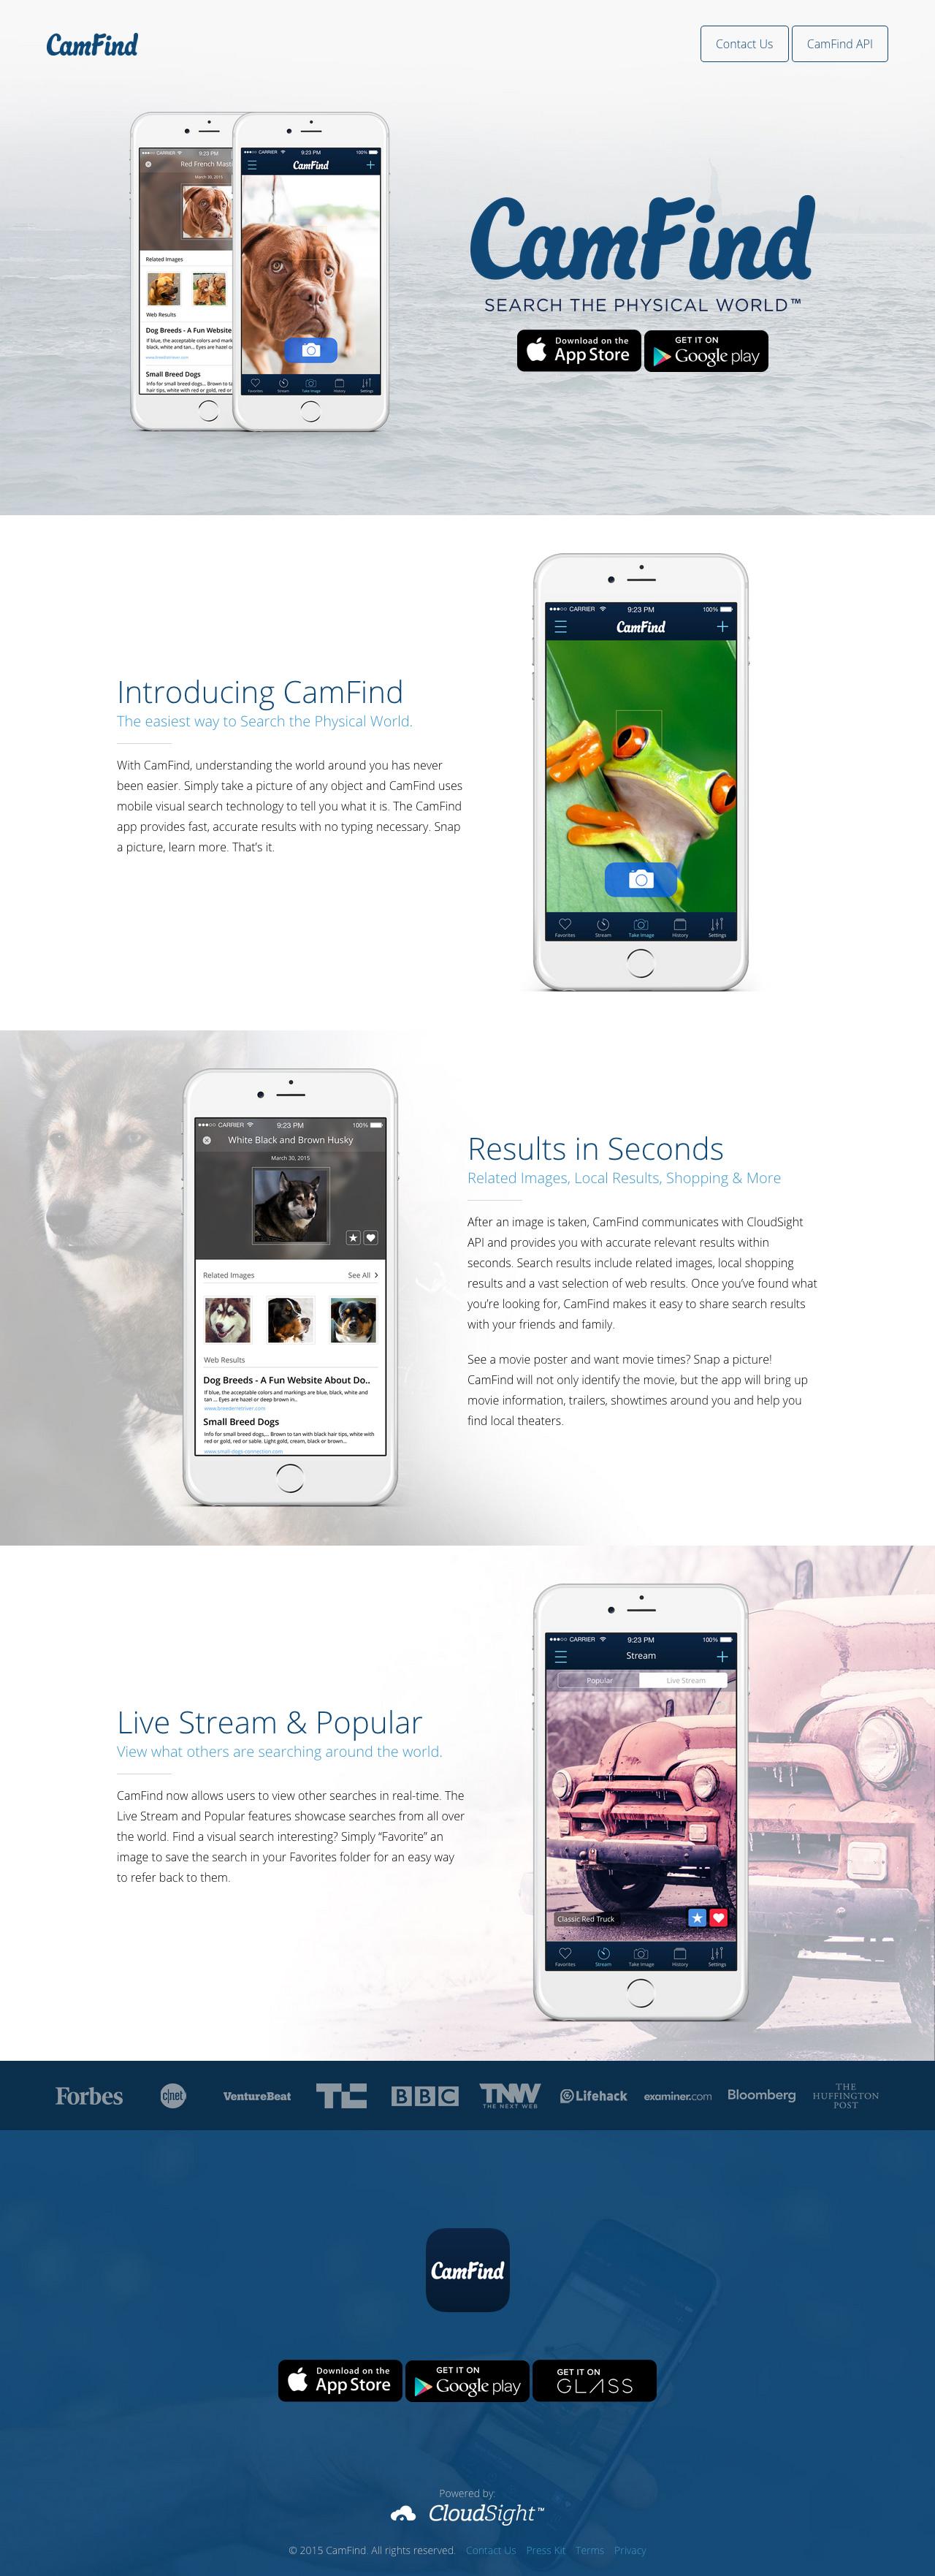 CamFind Website Screenshot